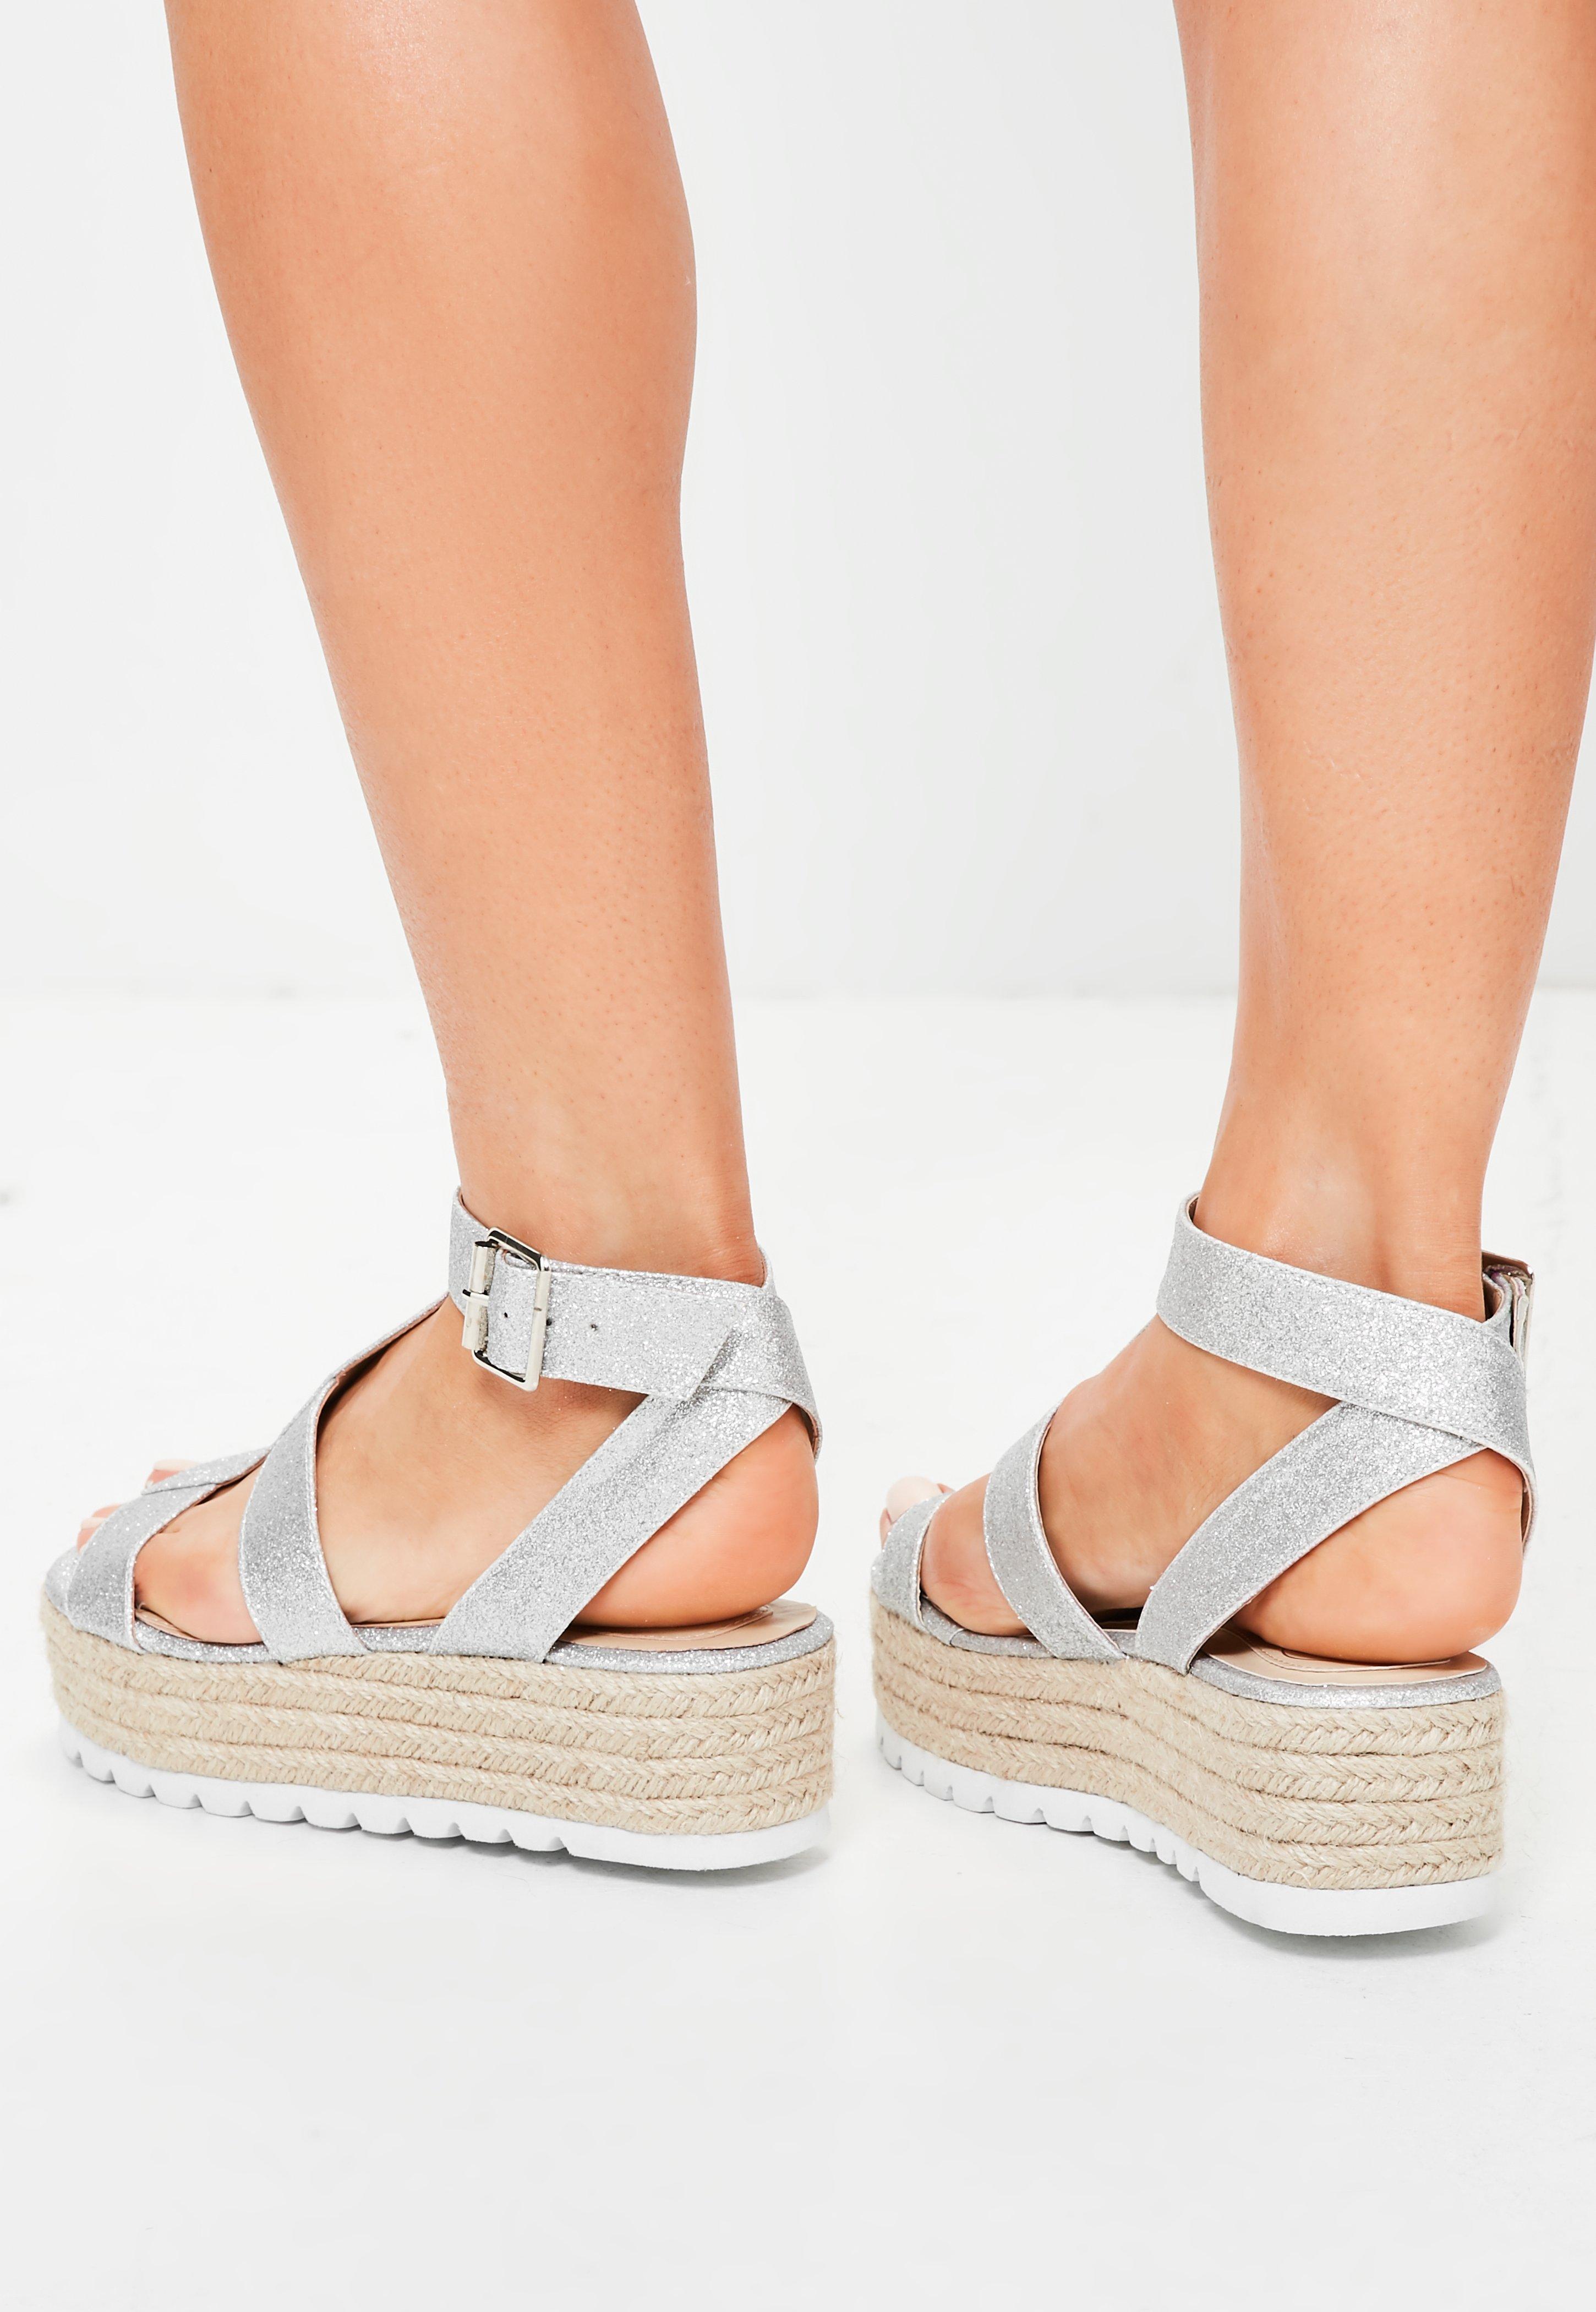 837435944f1f Lyst - Missguided Silver Glitter Platform Gladiator Sandals in Metallic